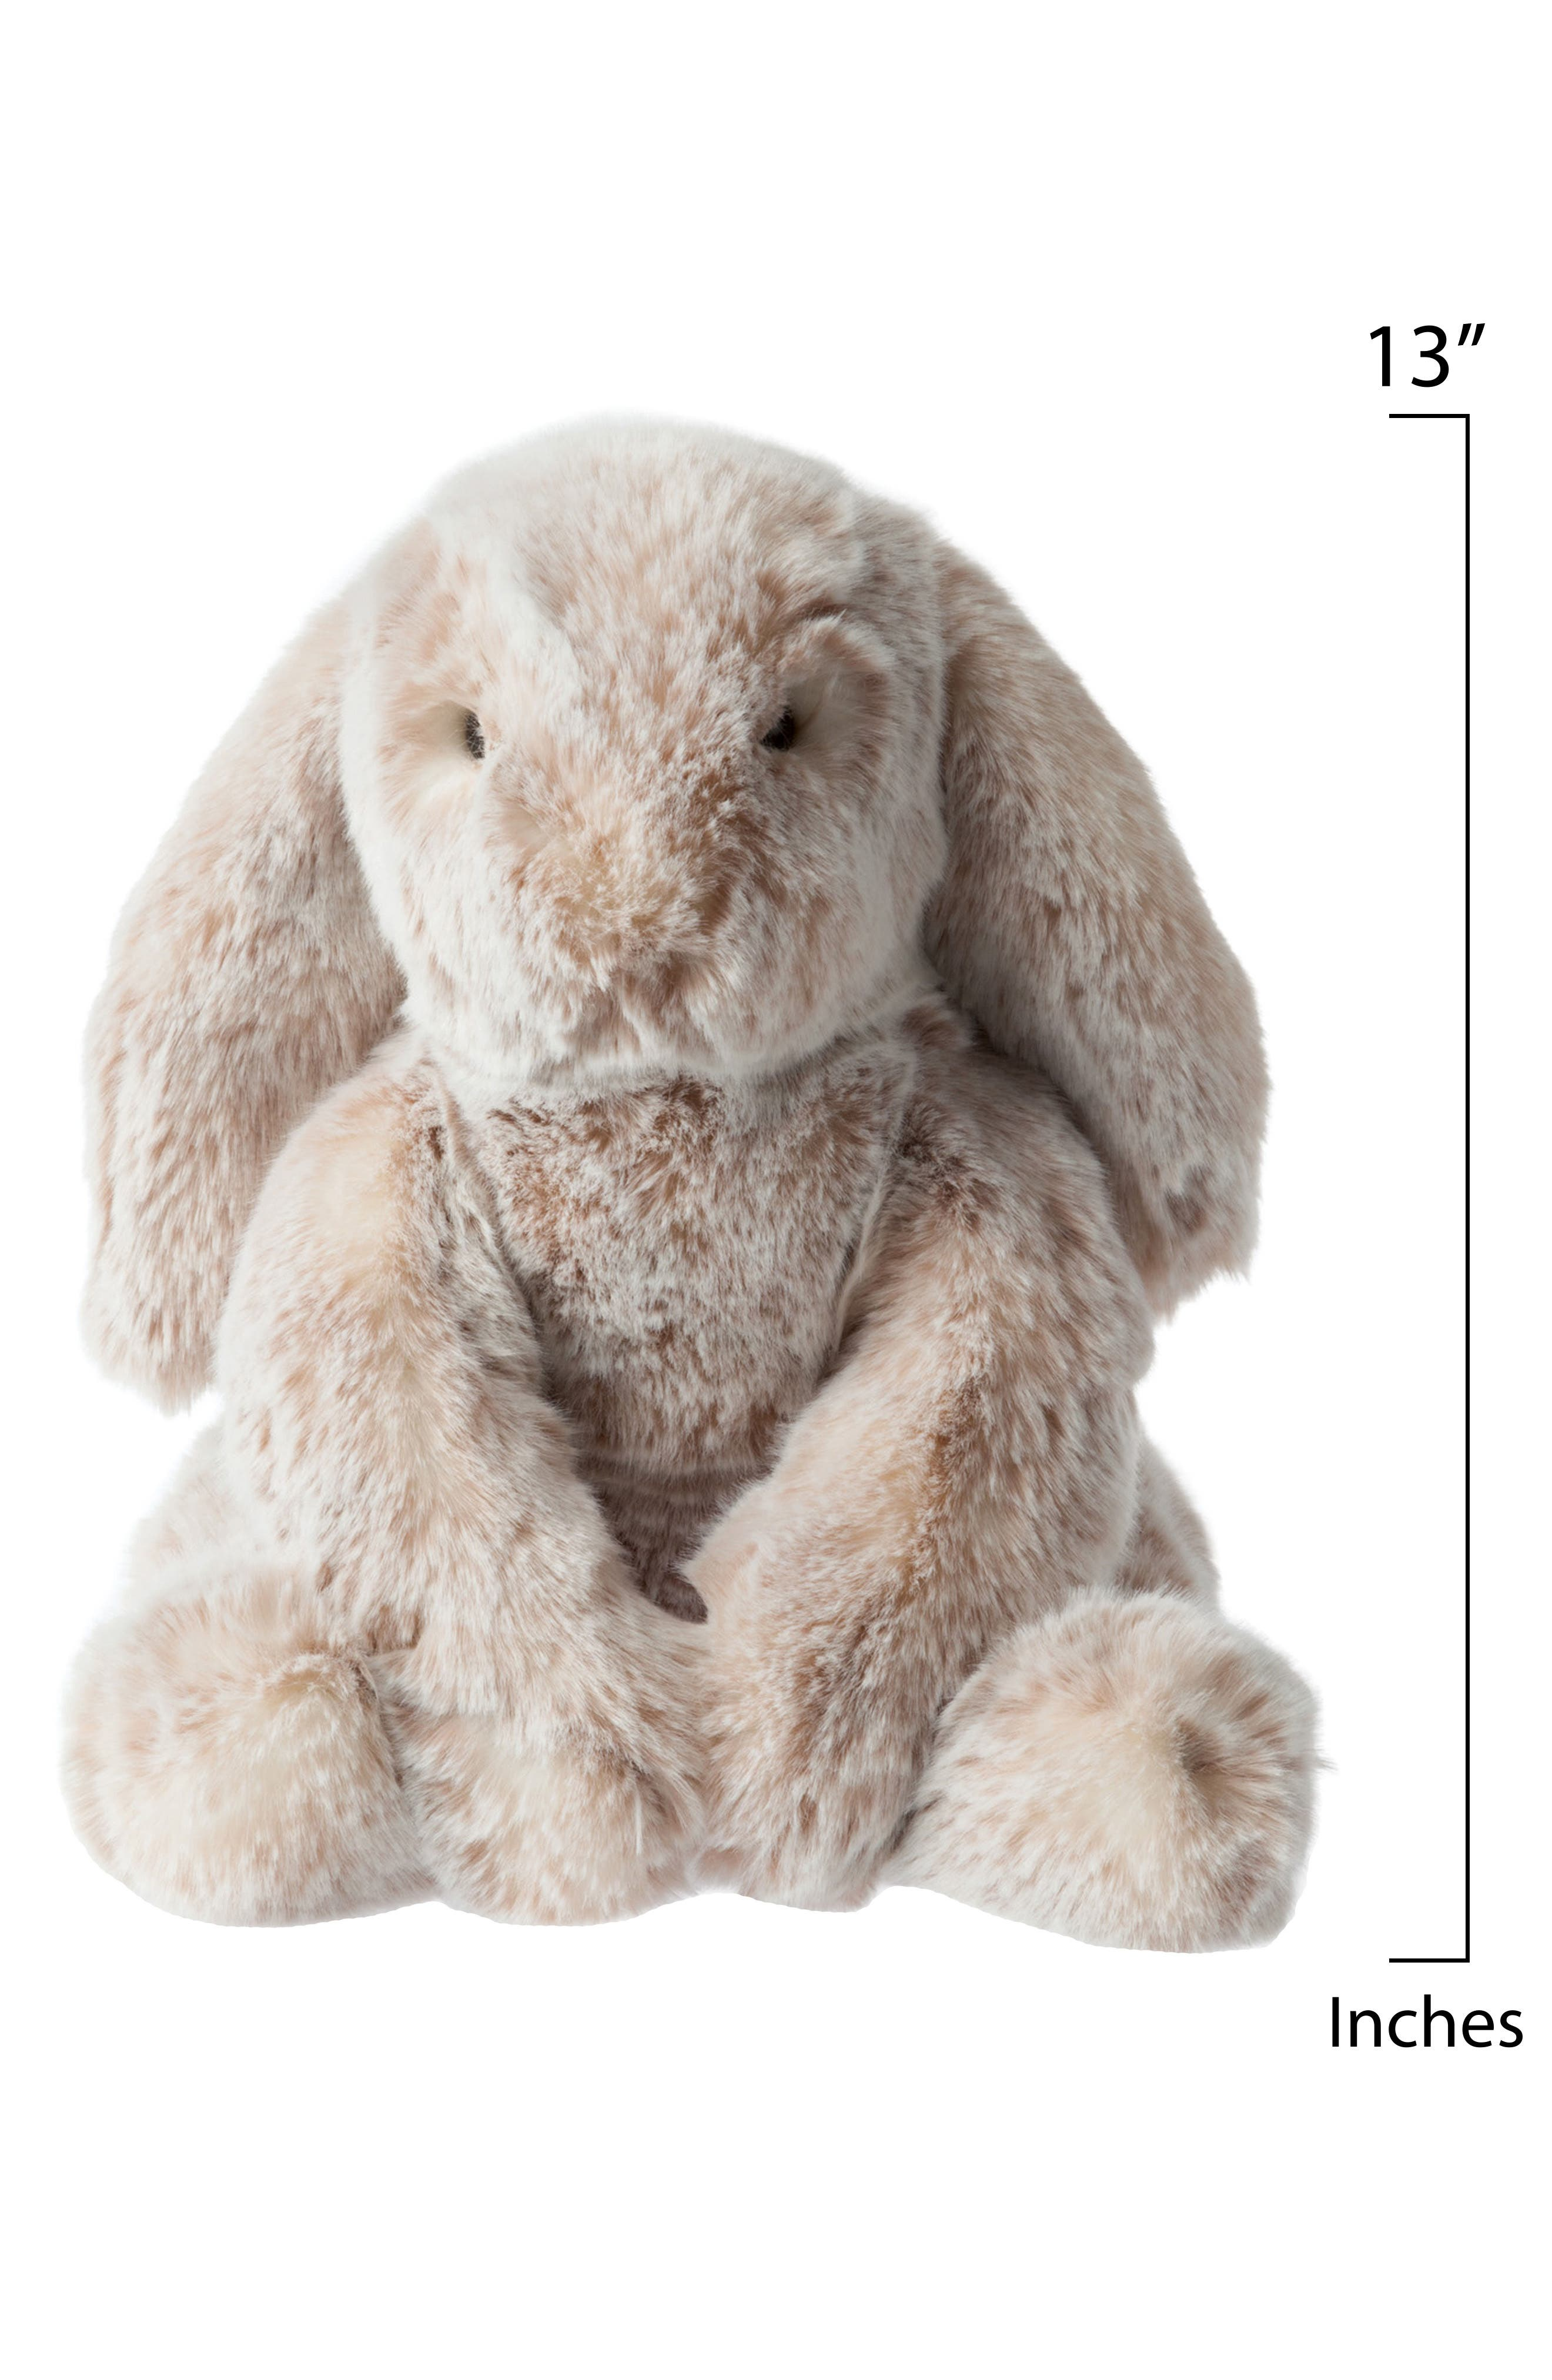 Luxe Bunny Stuffed Animal,                             Alternate thumbnail 2, color,                             200